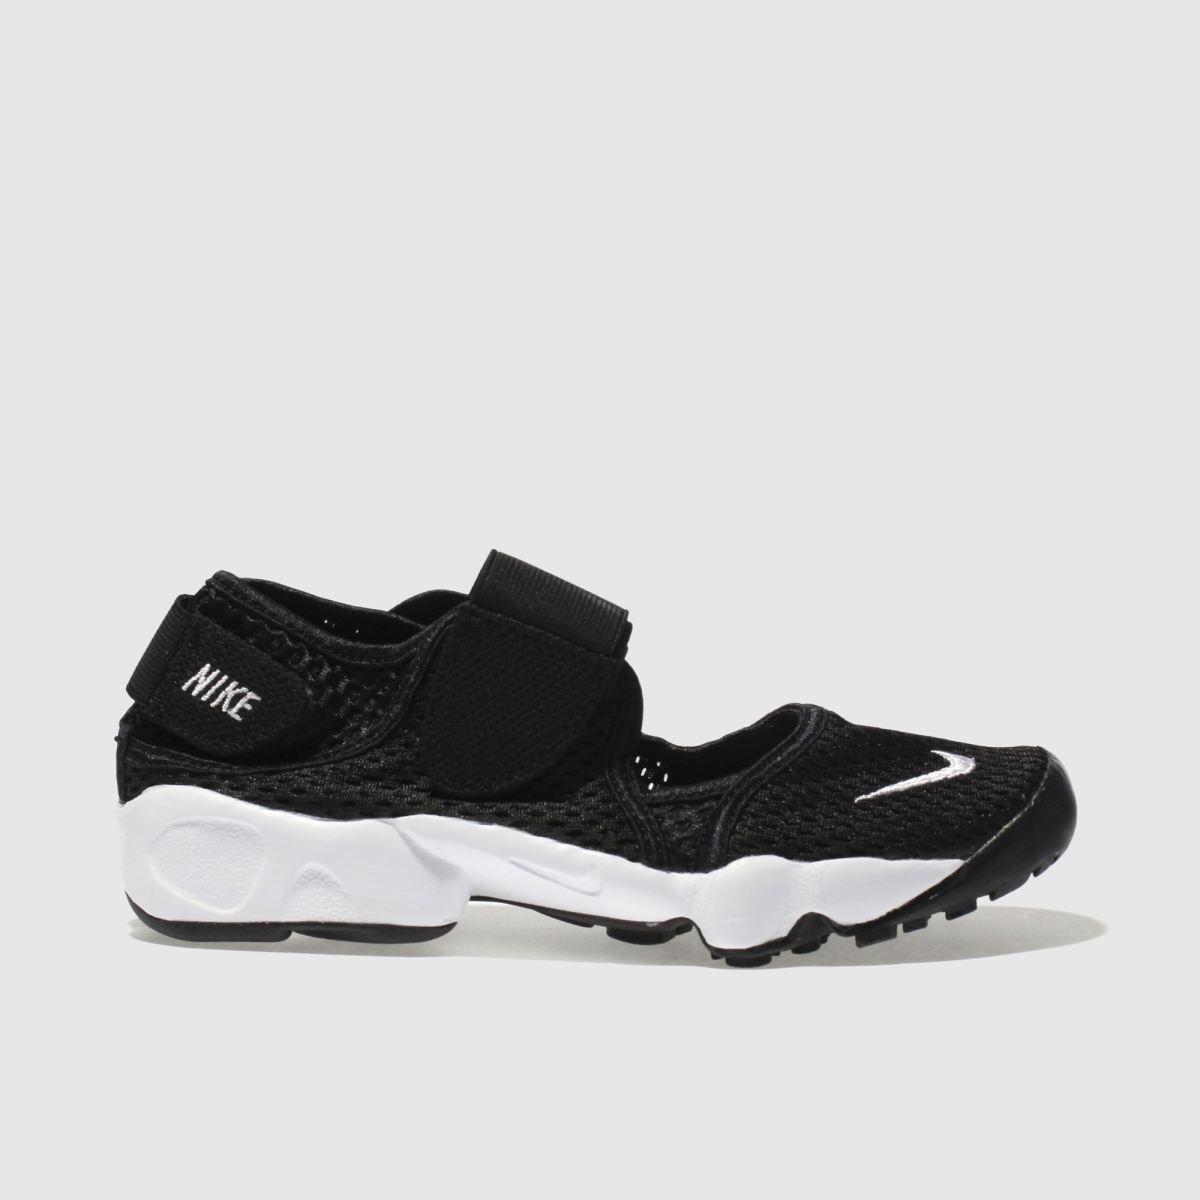 Nike Black Rift Trainers Junior